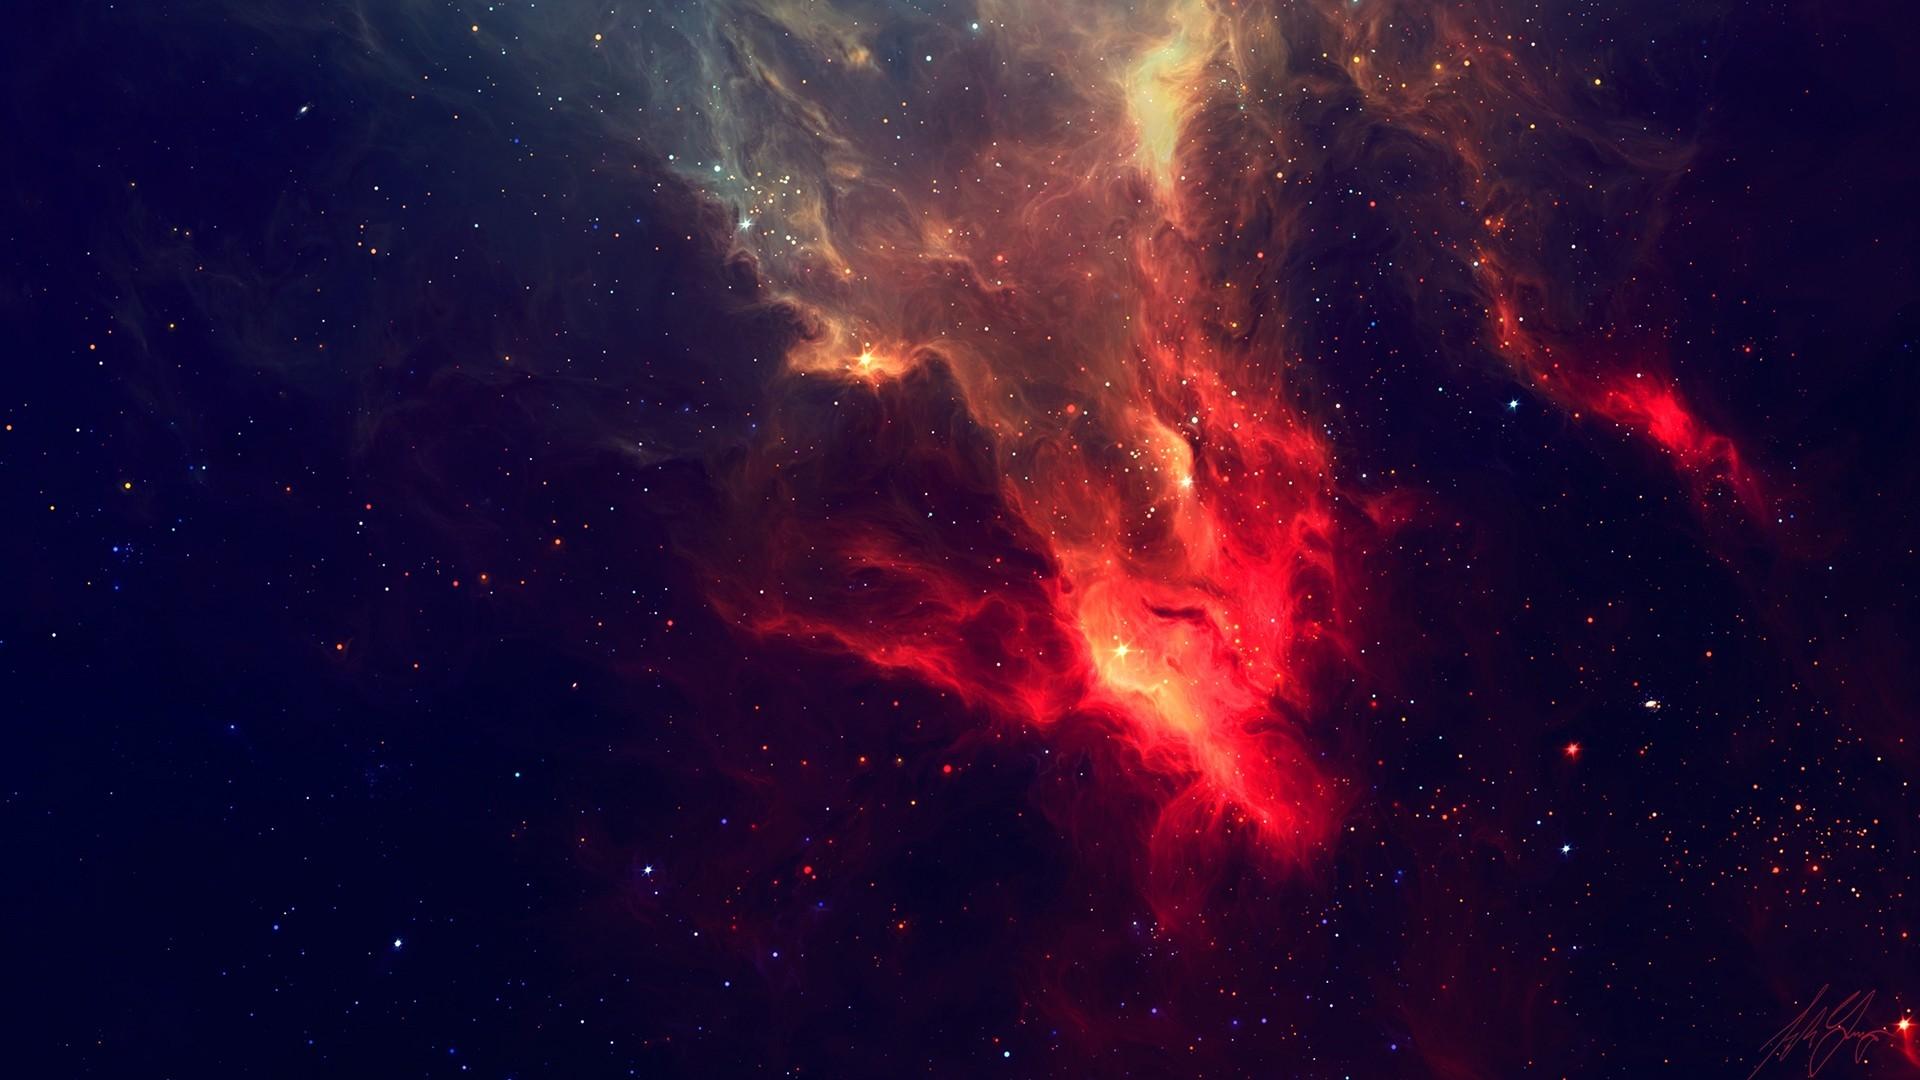 Galaxy+Tumblr | Andromeda Galaxy Tumblr Resolution Wallpaper Pictures